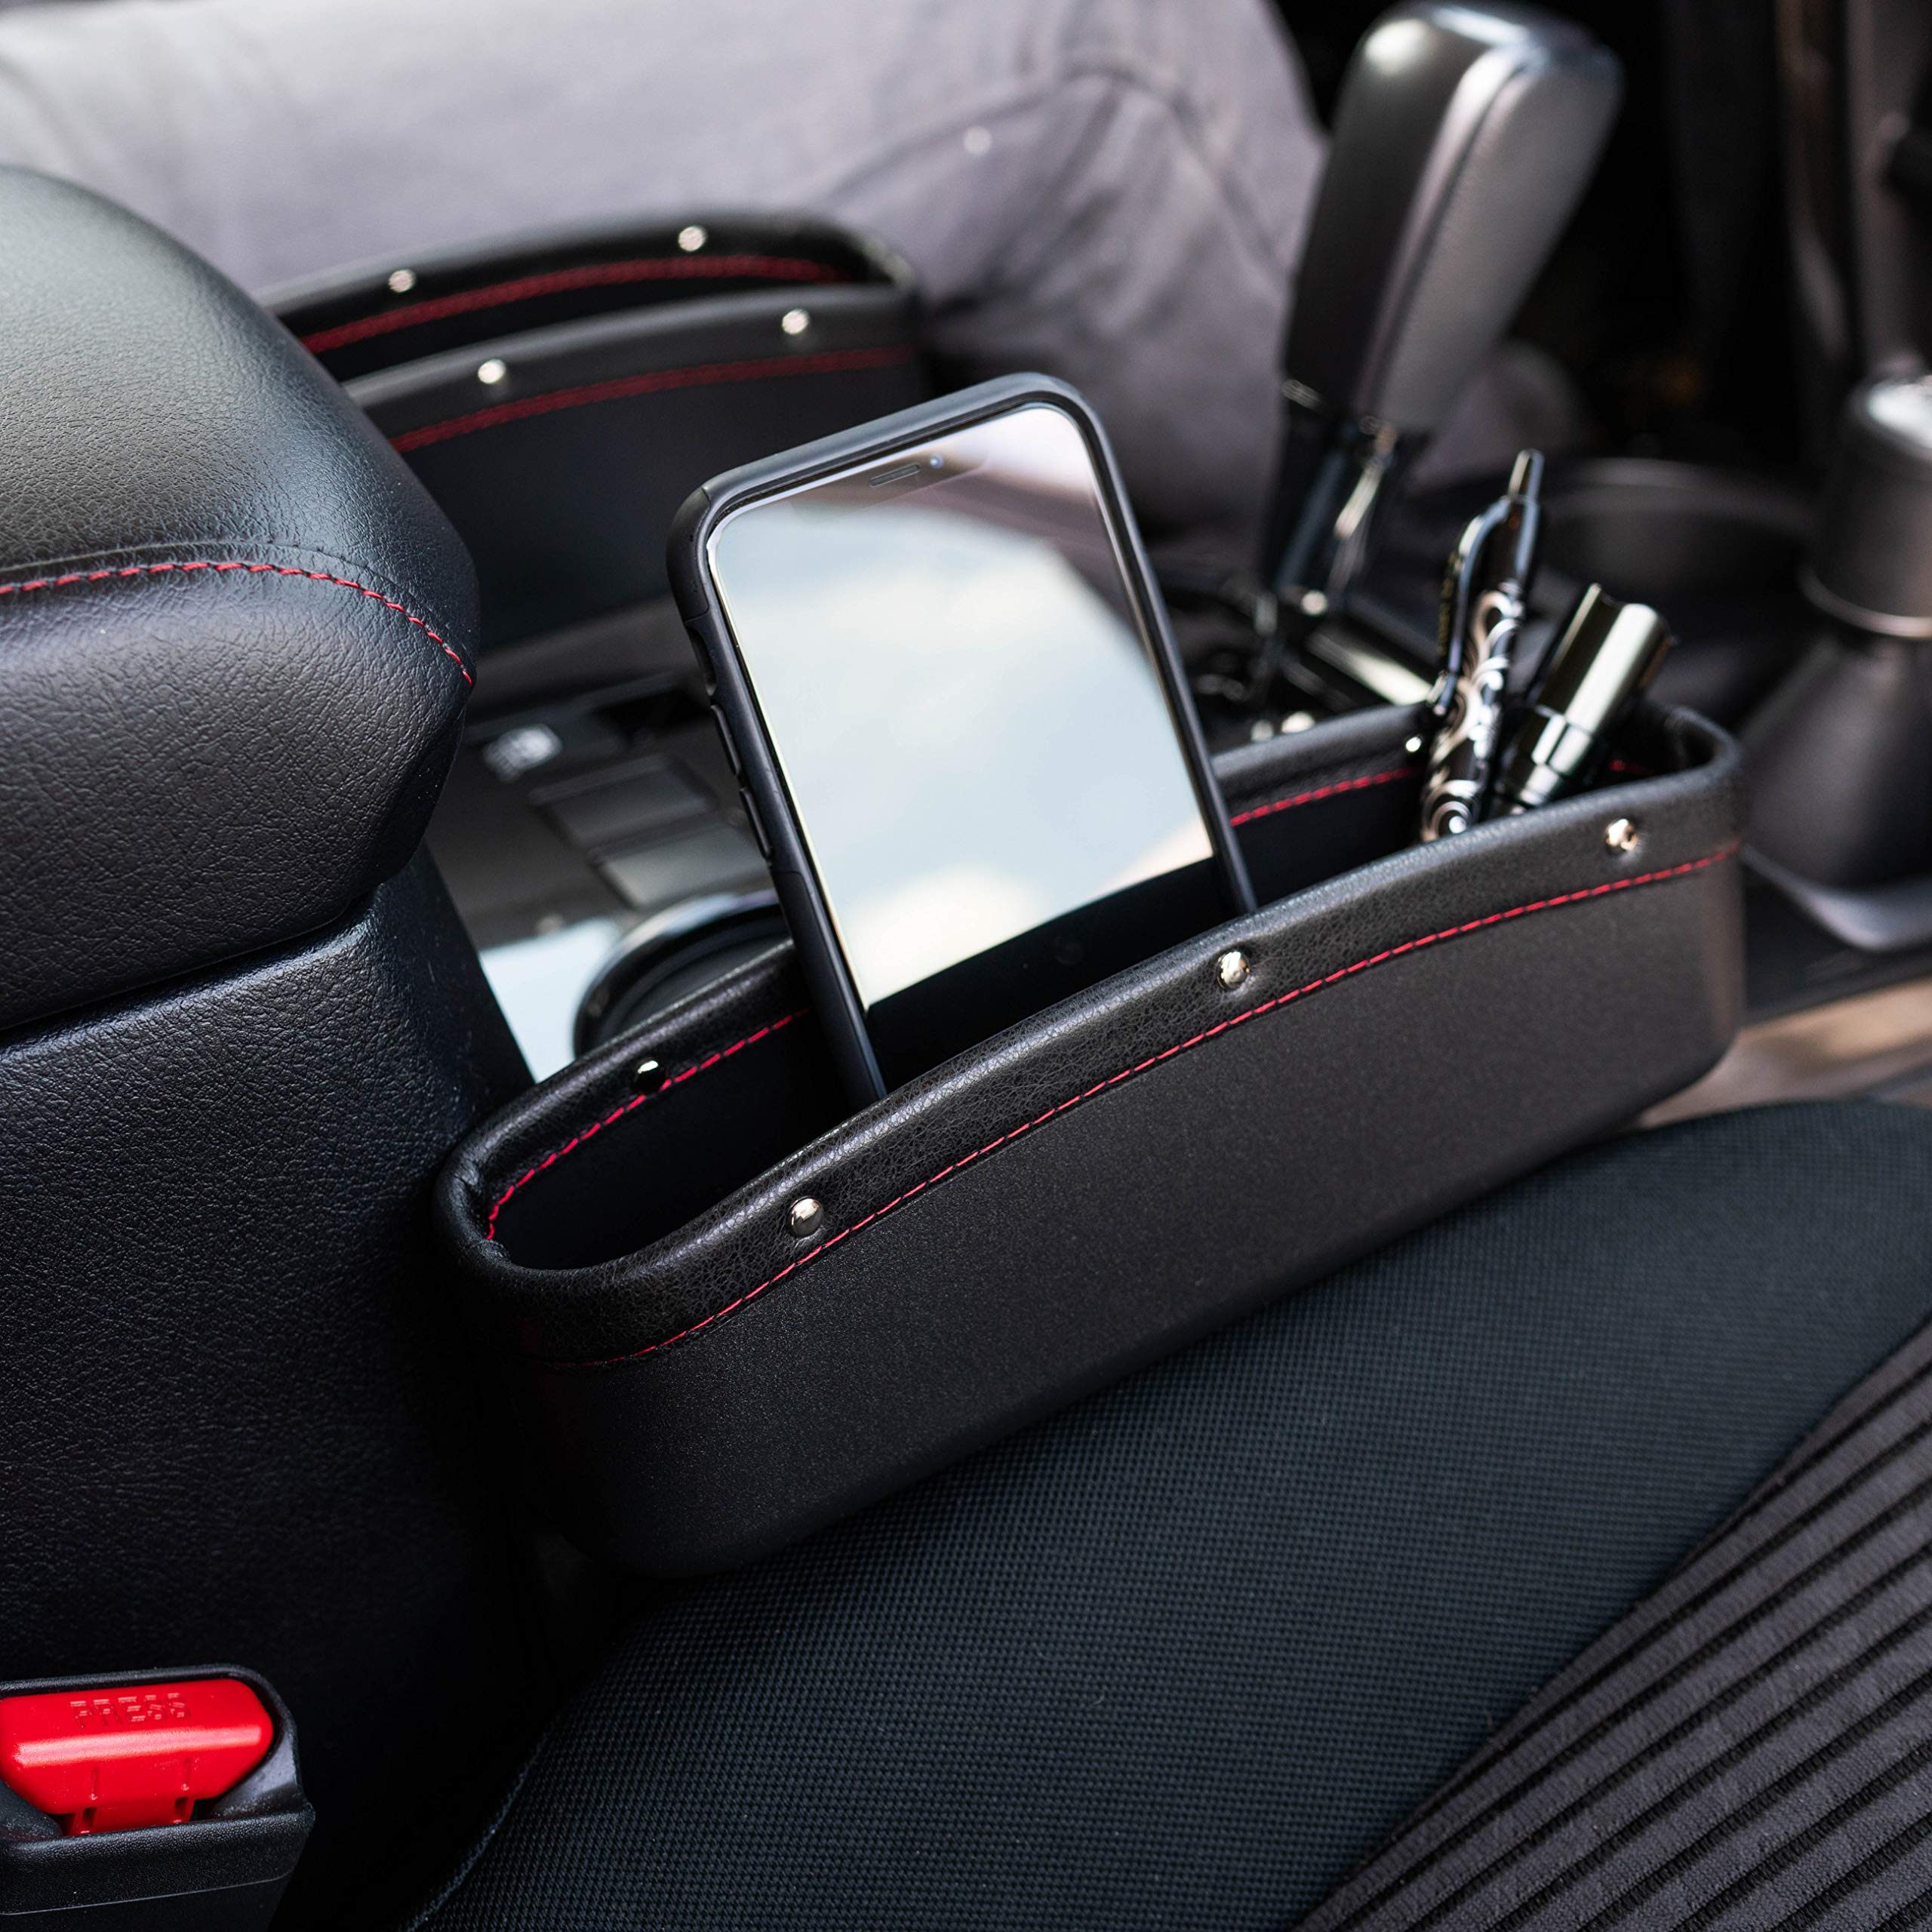 ONE Seat Gap Holder-Filler Pockets Car Free Emergency Flashlight, Premium PU Leather Car Organizer Pocket Easy Access to Phone Small Items